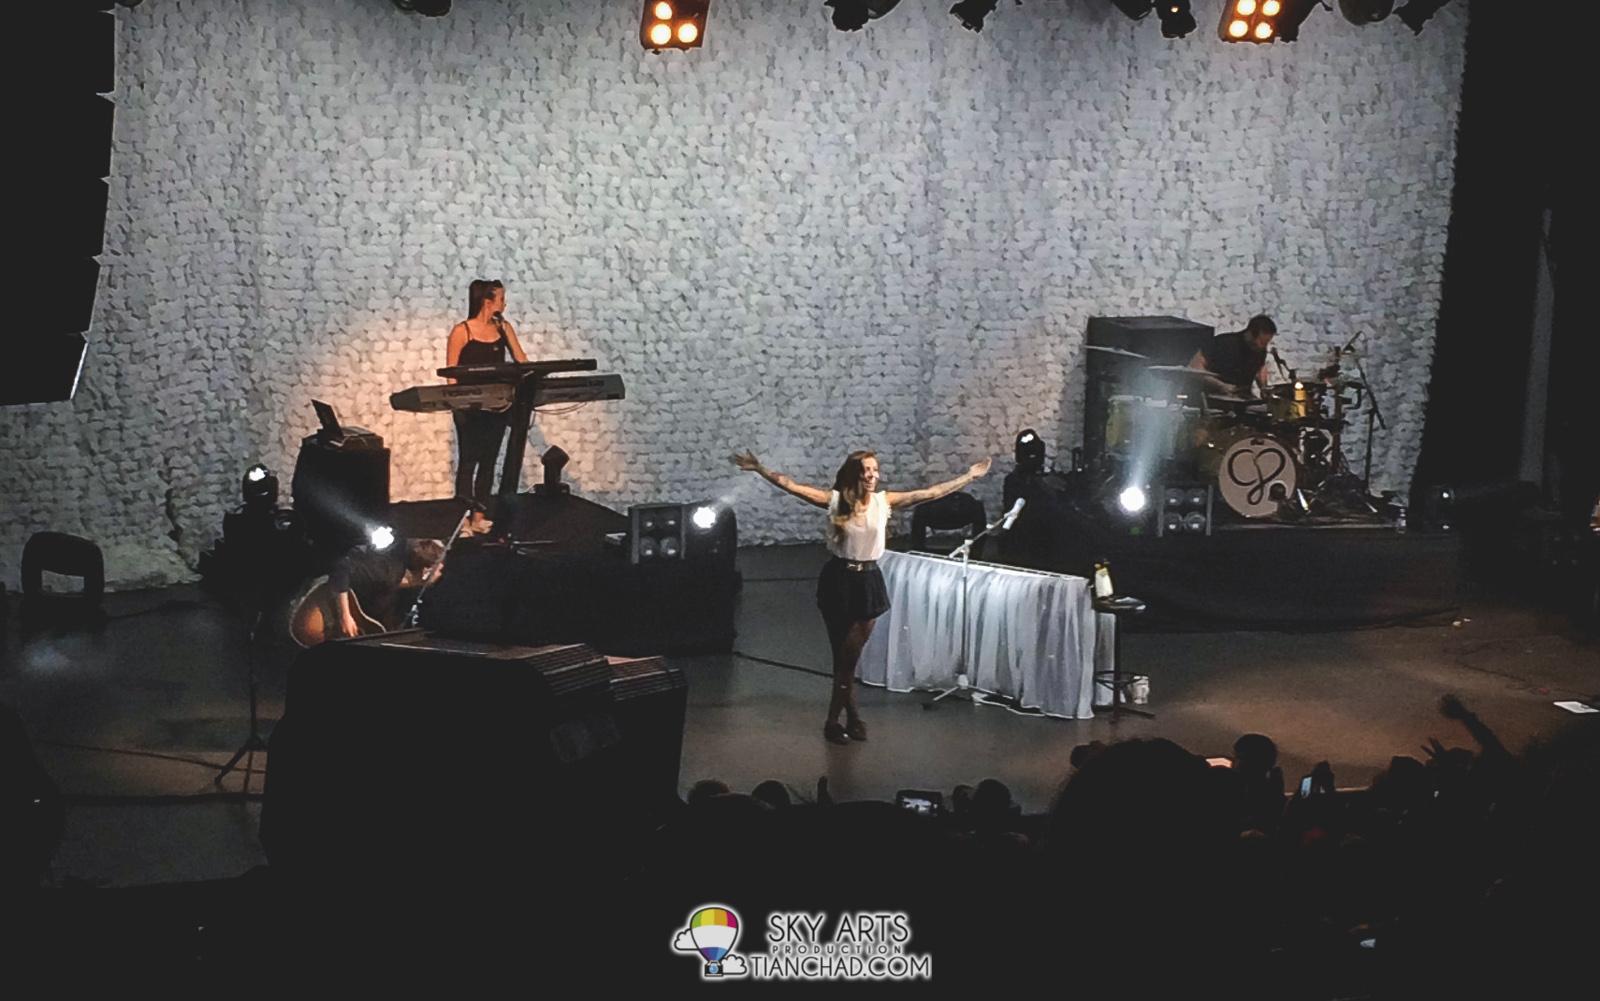 Christina Perri Live in KL 2015 - Actual Concert Night @ KL Live Elegant side of Christina Perri. Oh wait she has been always elegant!